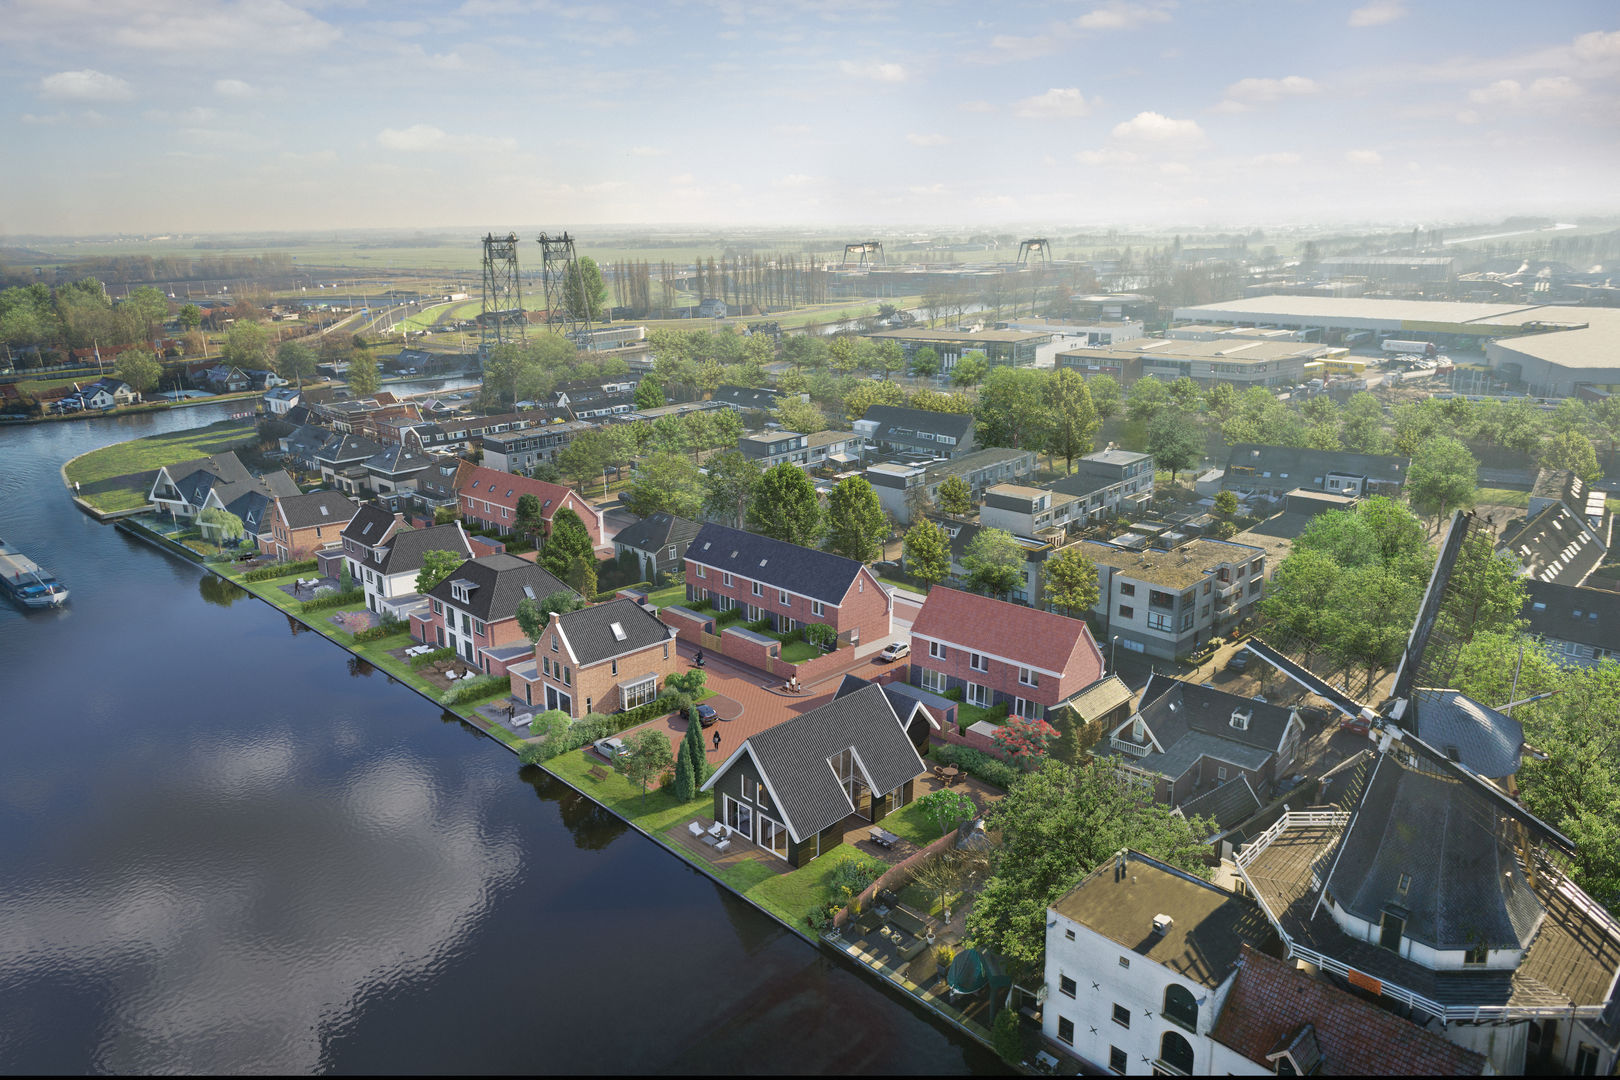 Verkoopstart project Werfkade in Alphen a/d Rijn 21 januari